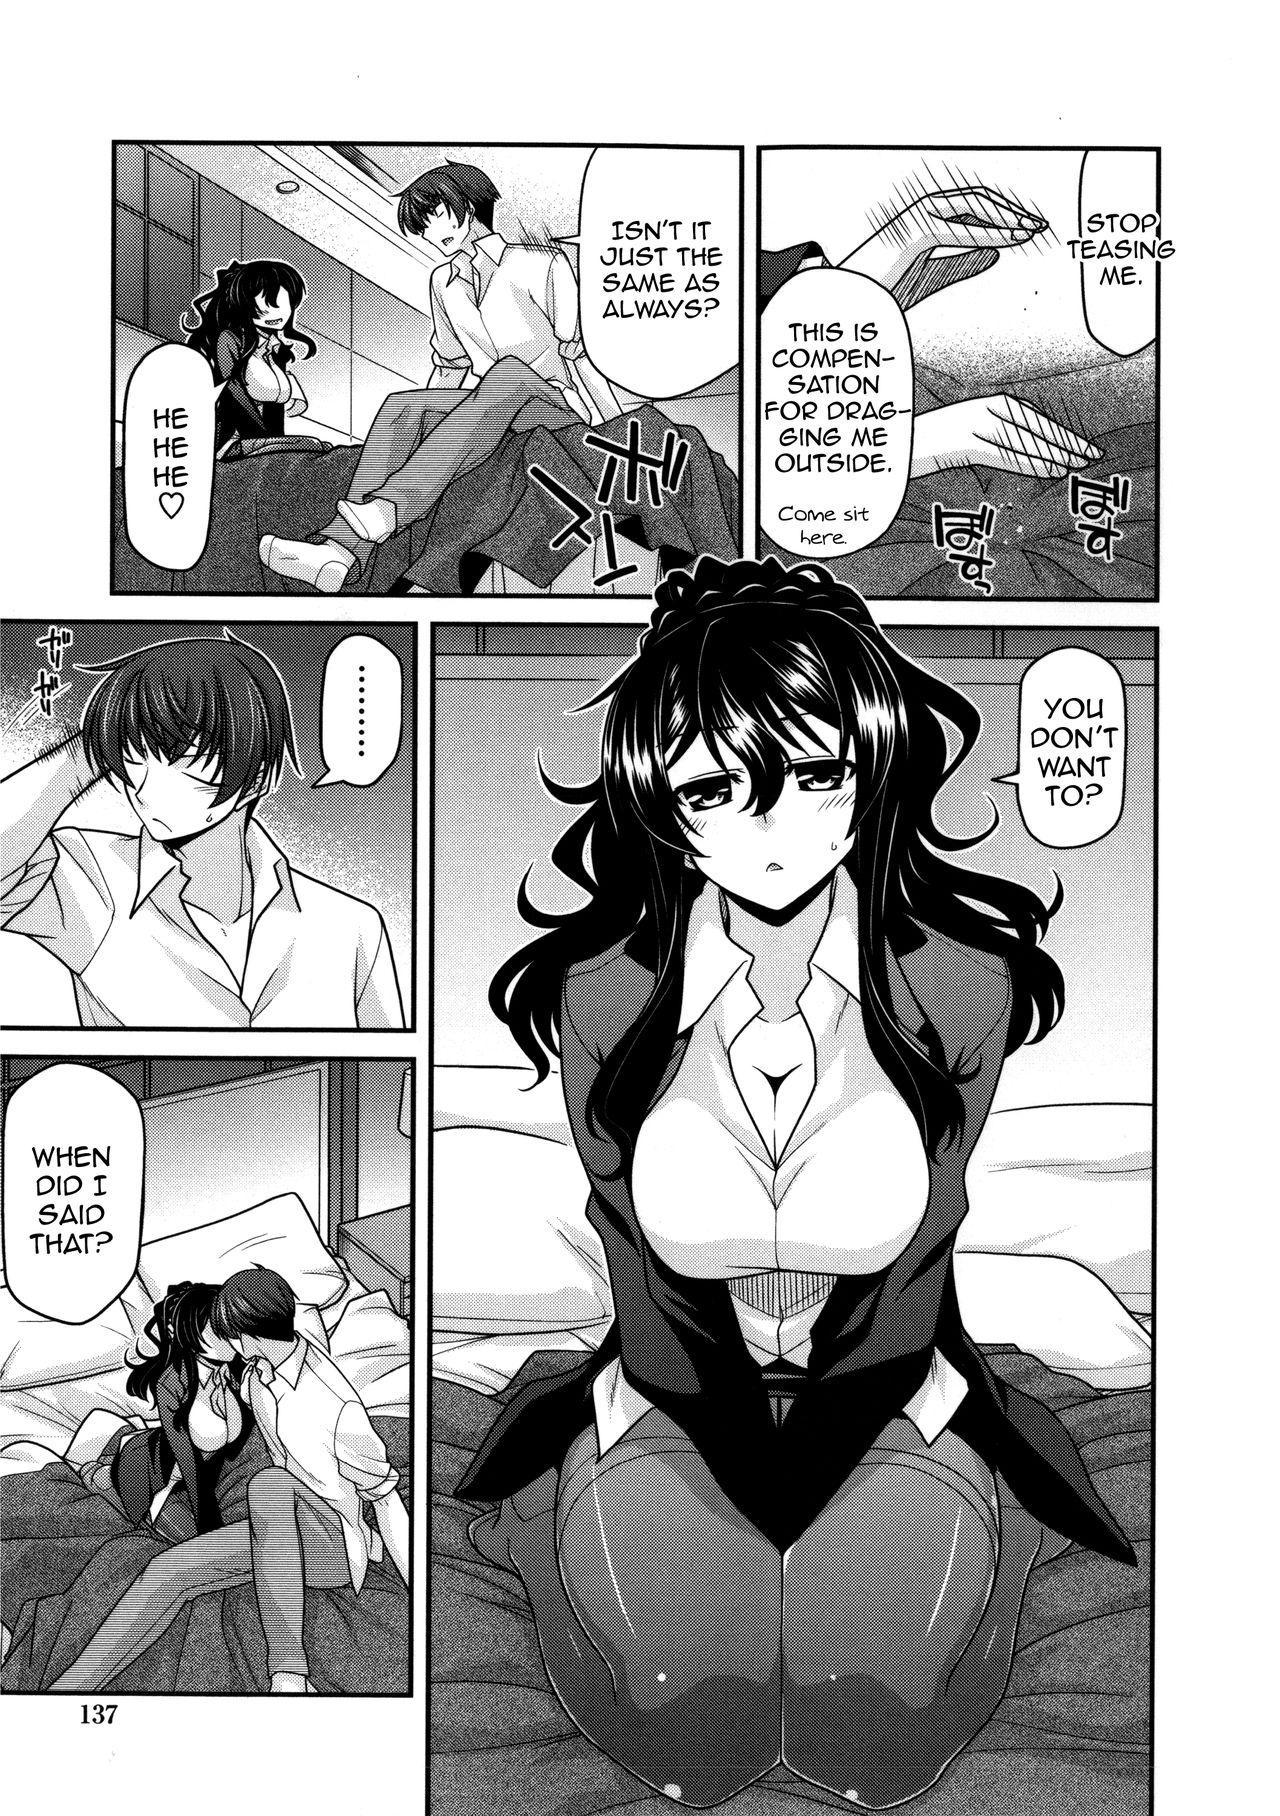 [Miyashiro Sousuke] Yamato Nadeshiko Chichi Henge - Yamato Nadeshiko Breast Changes Ch. 0-1, 4, 7-9 [English] 53